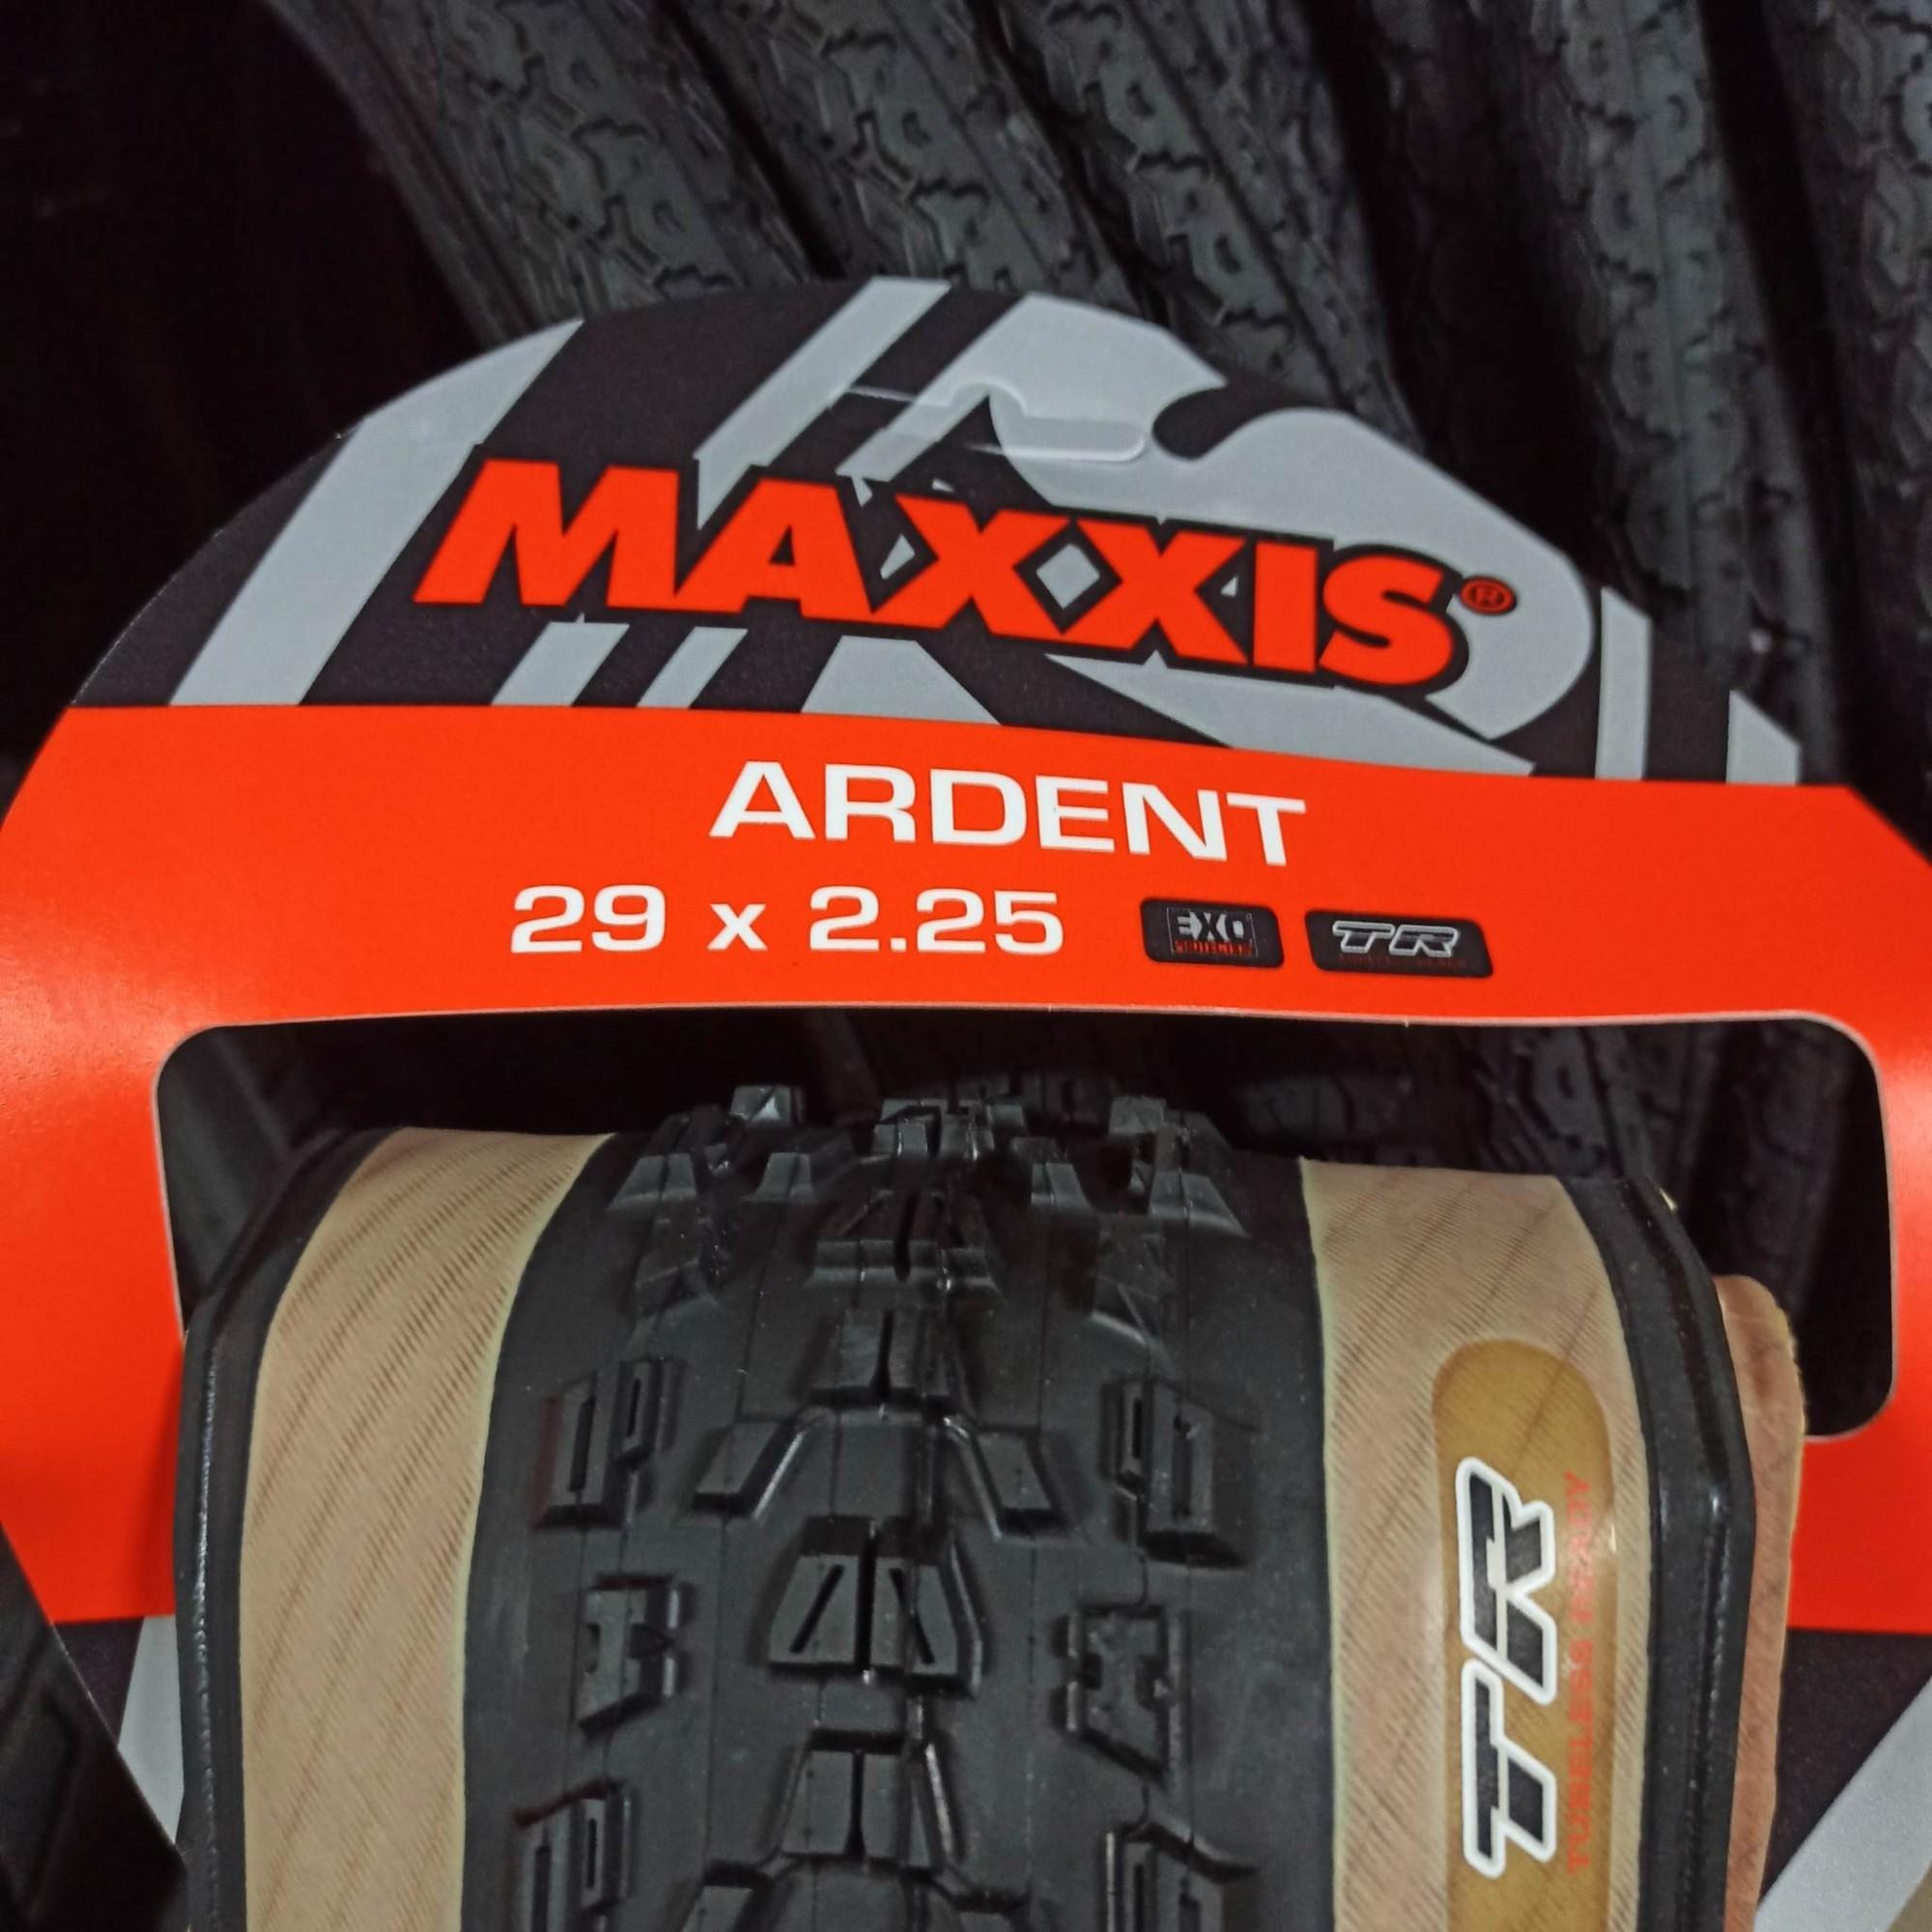 02 Un. Pneu Maxxis 29 x 2.25 Ardent M315RU Tubeless Skinwall Exo com faixa bege